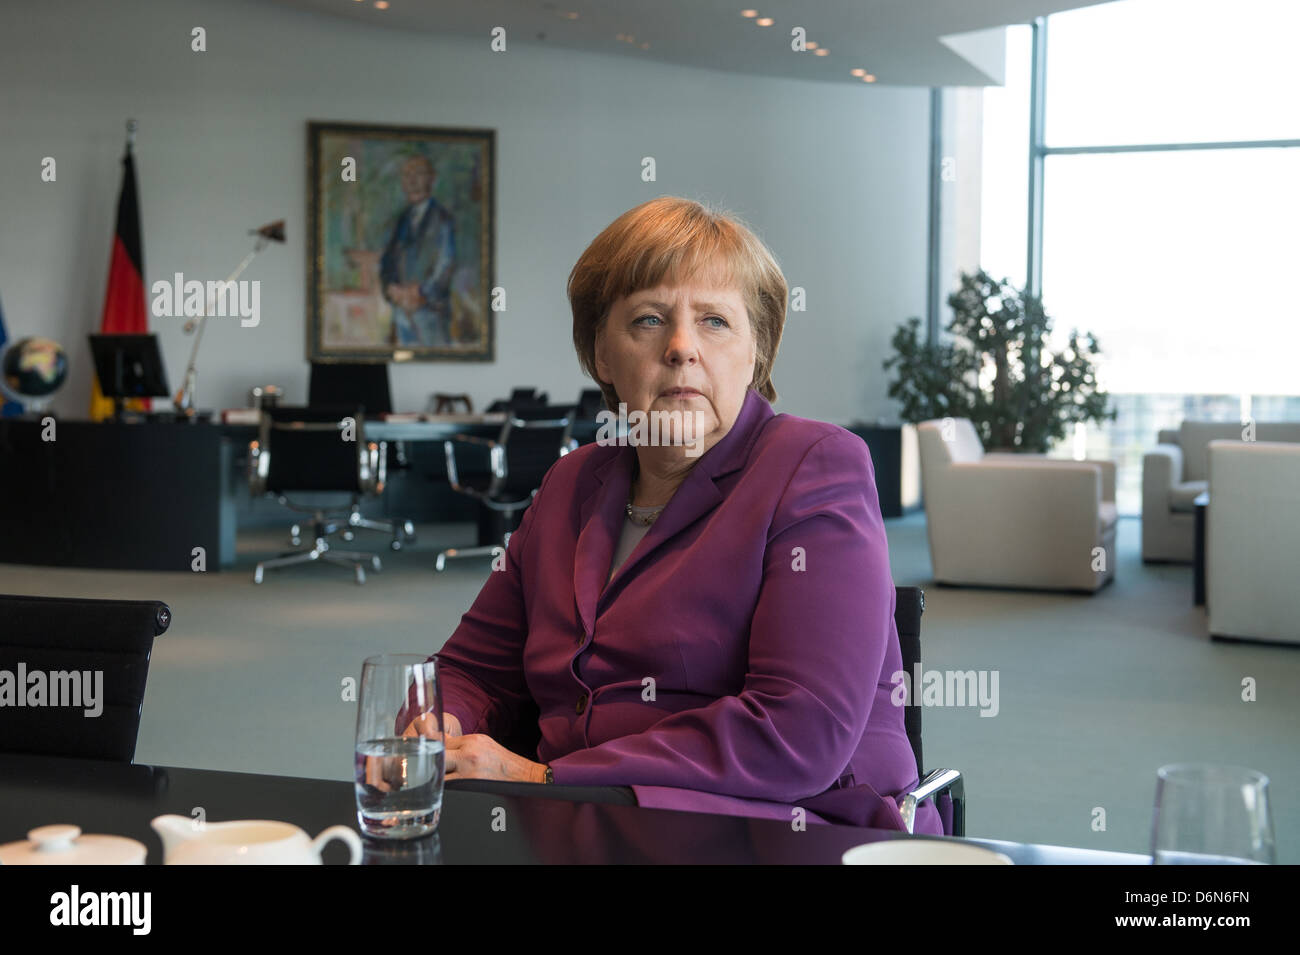 federal office interview stock photos federal office interview berlin german chancellor angela merkel cdu in an interview in her